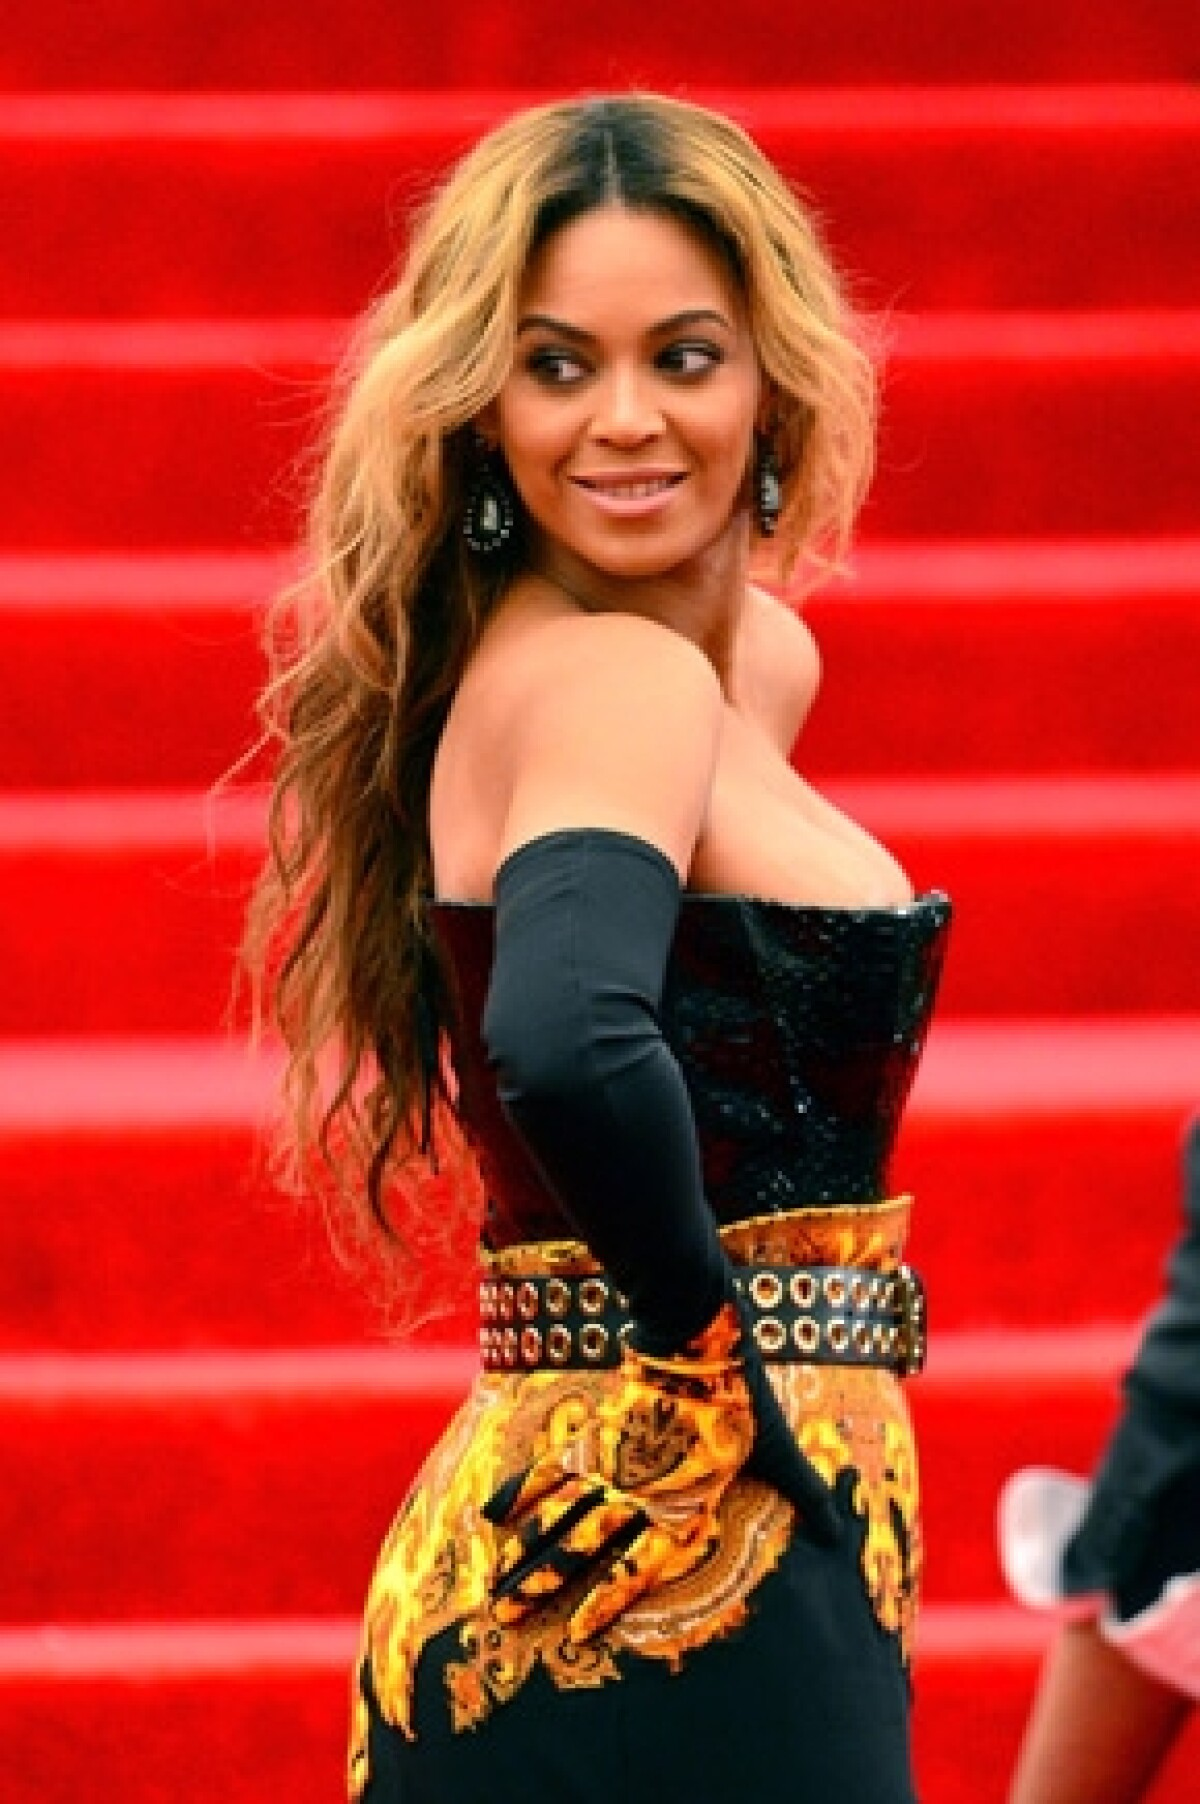 Aseguran que Beyoncé está embarazada